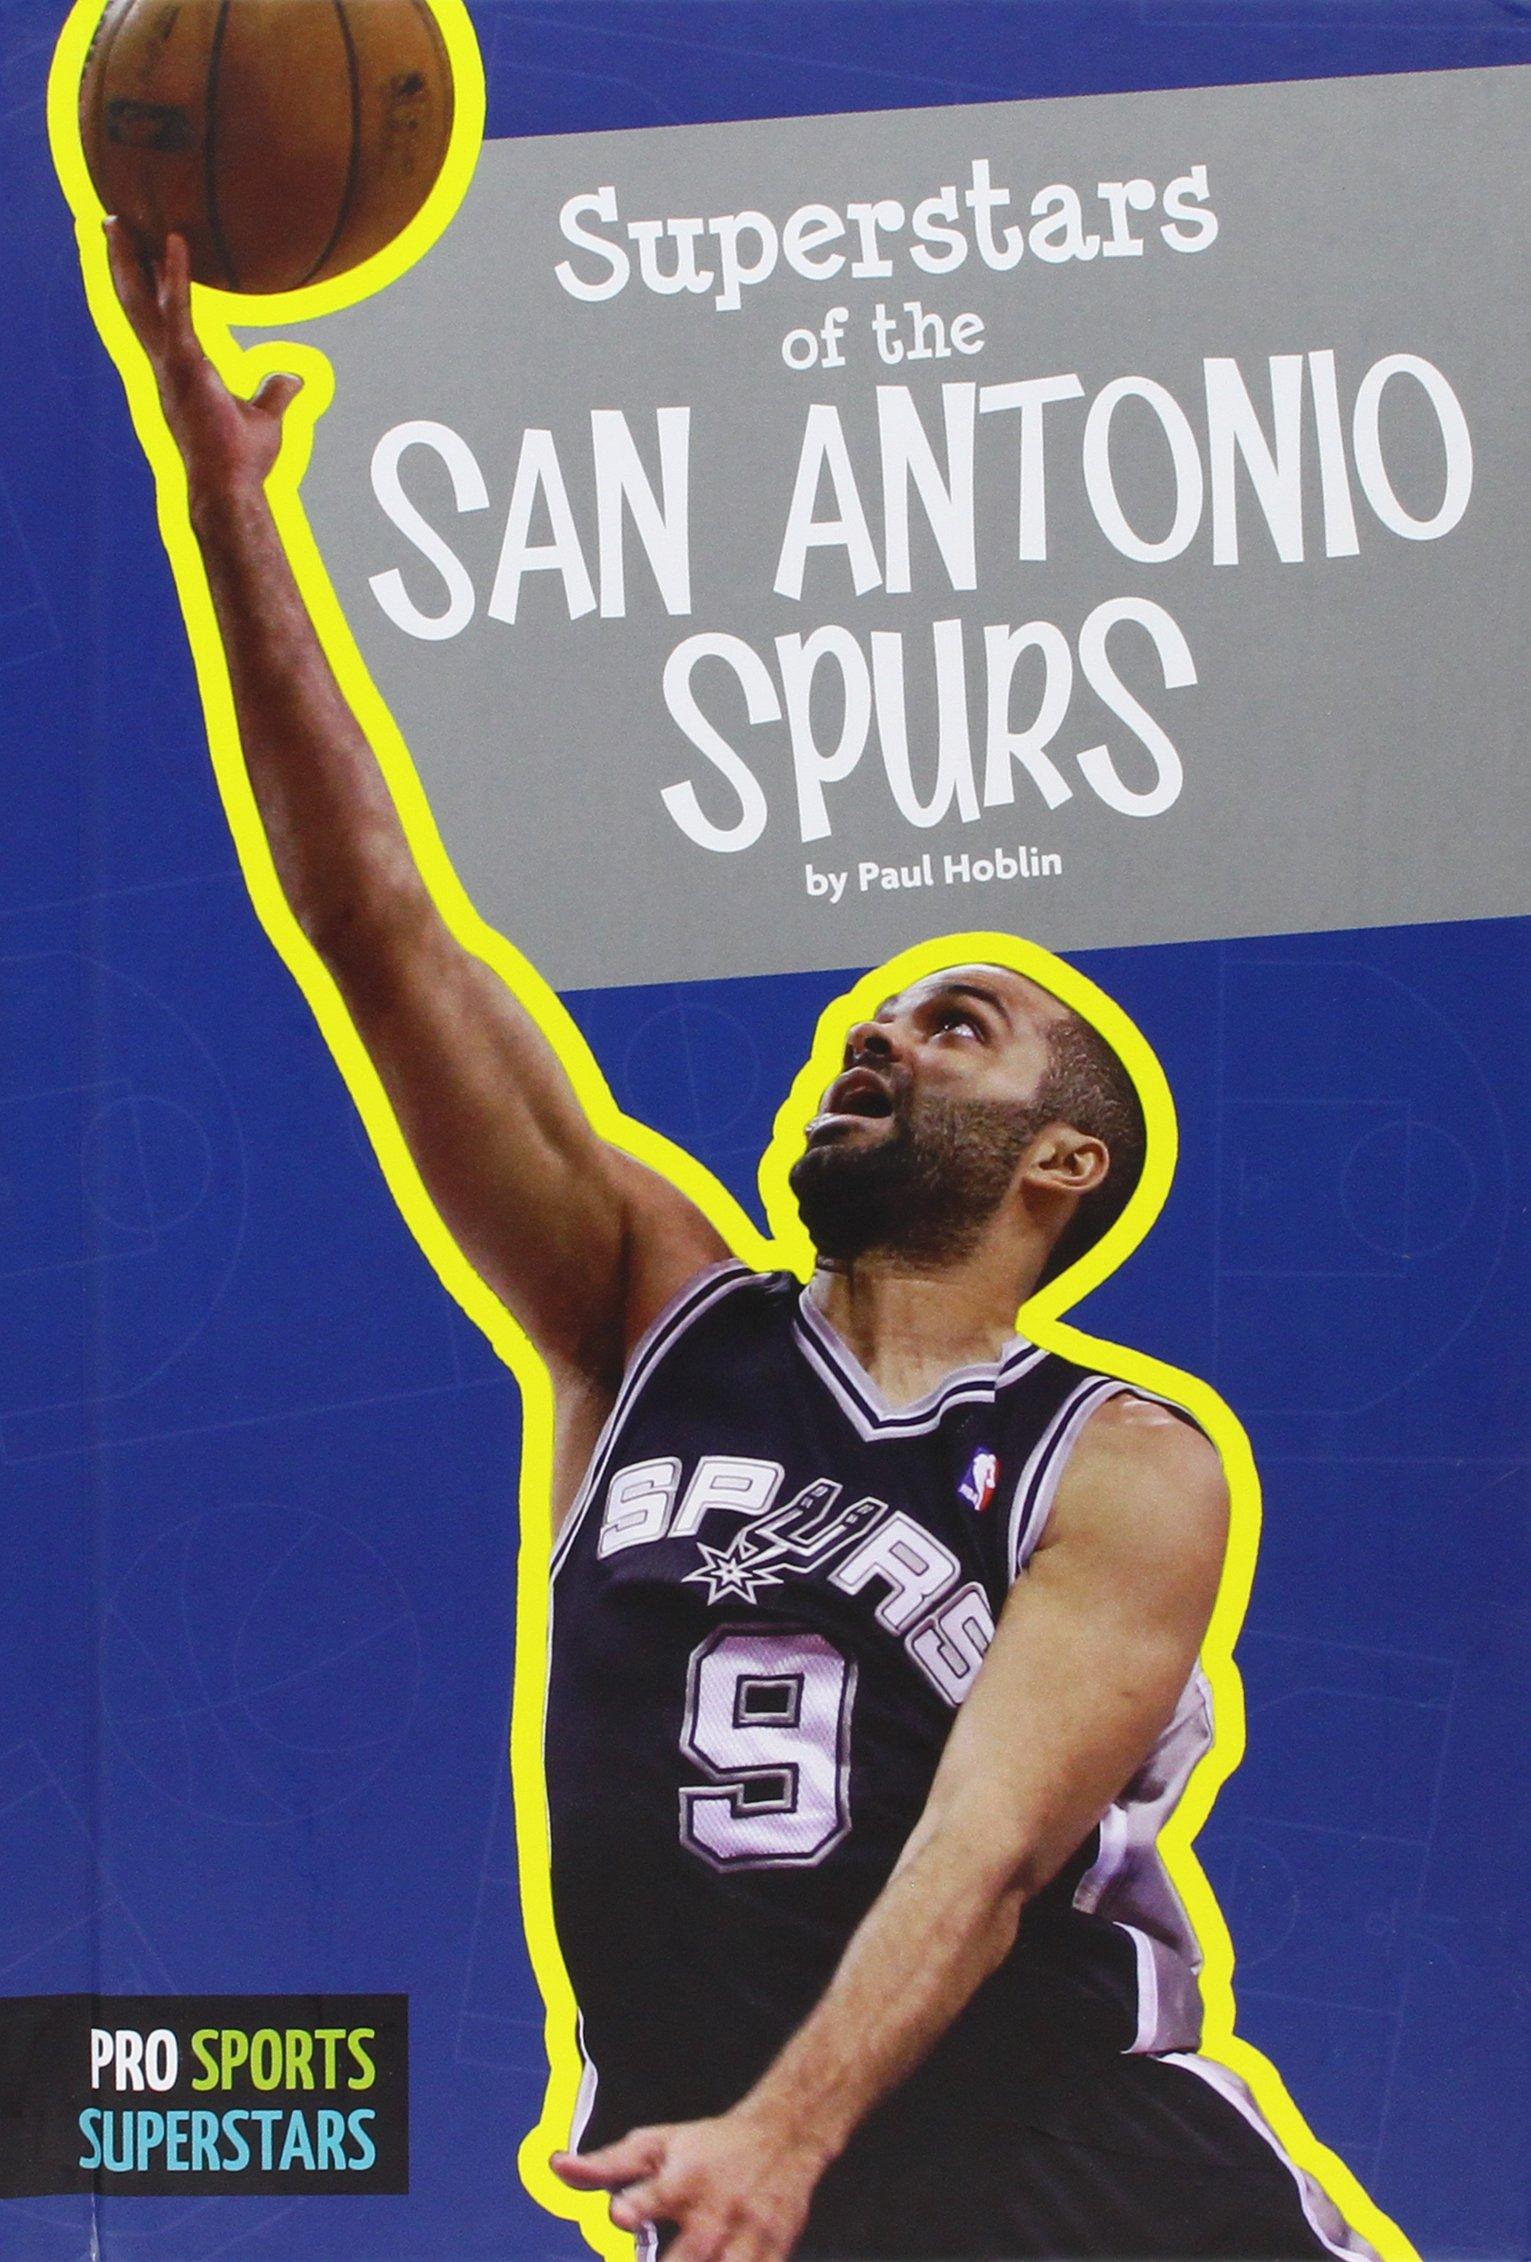 Superstars of the San Antonio Spurs (Pro Sports Superstars NBA)